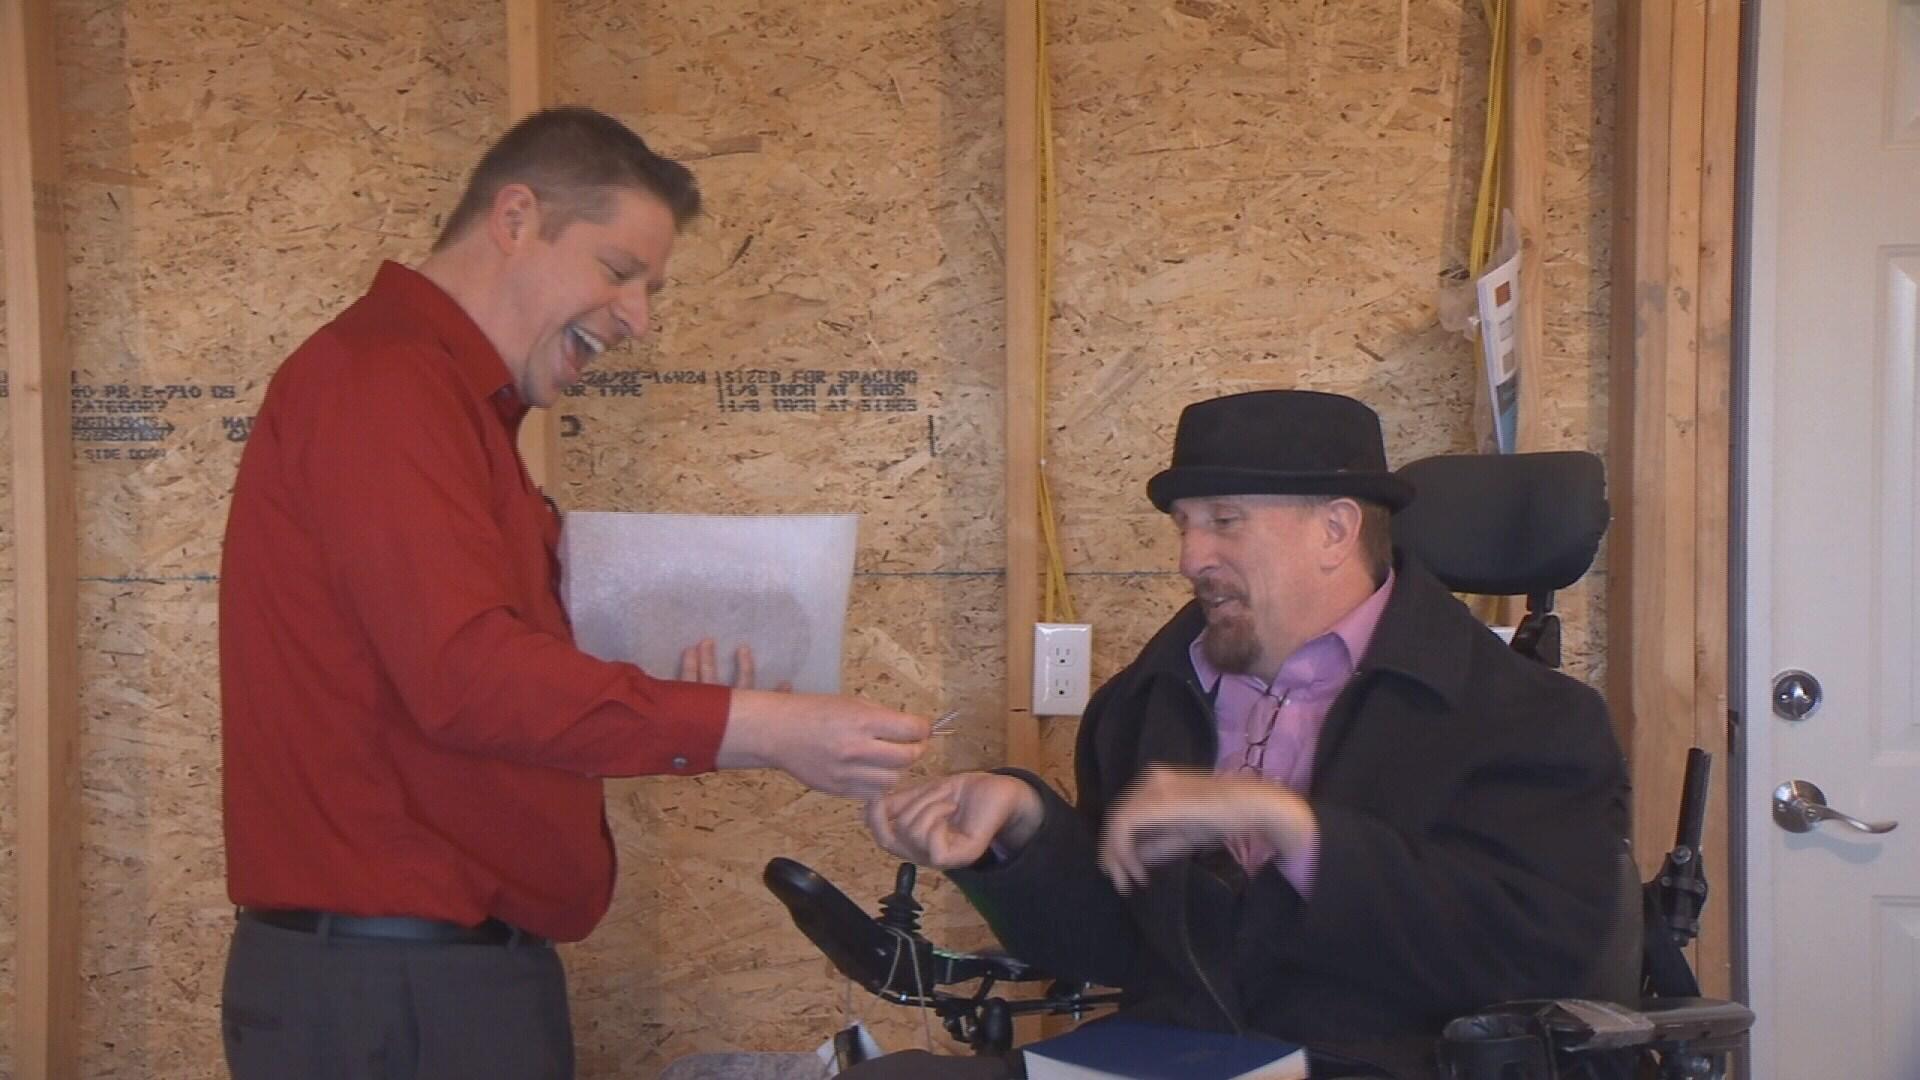 Jim Woolyhand gives keys to Jim Brown.